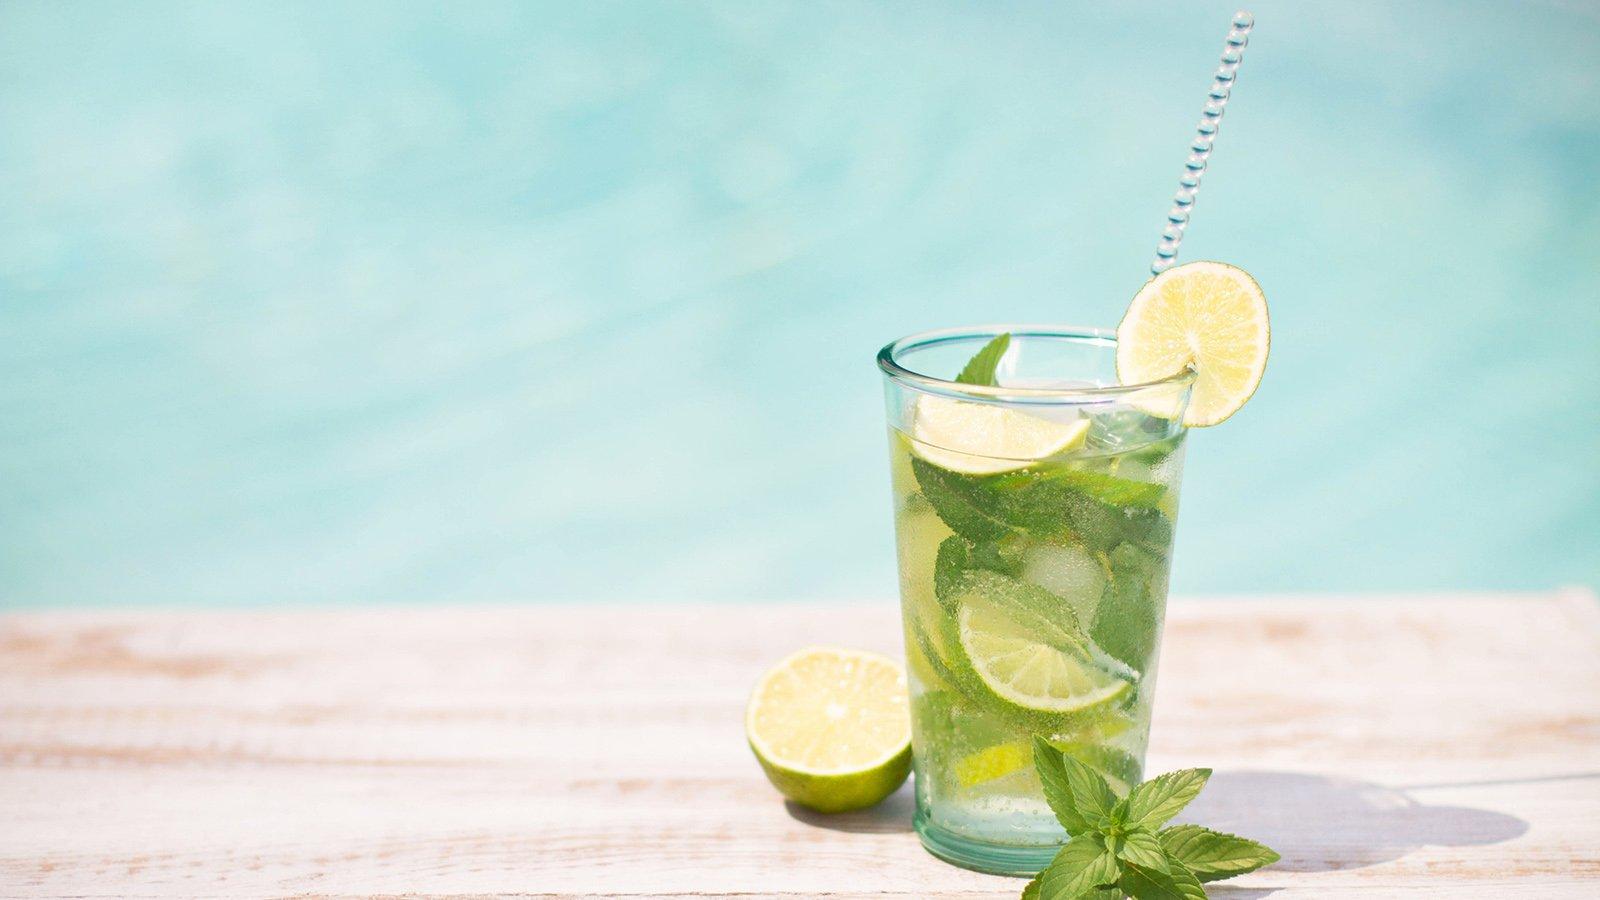 Cocktail Innahura Maldives